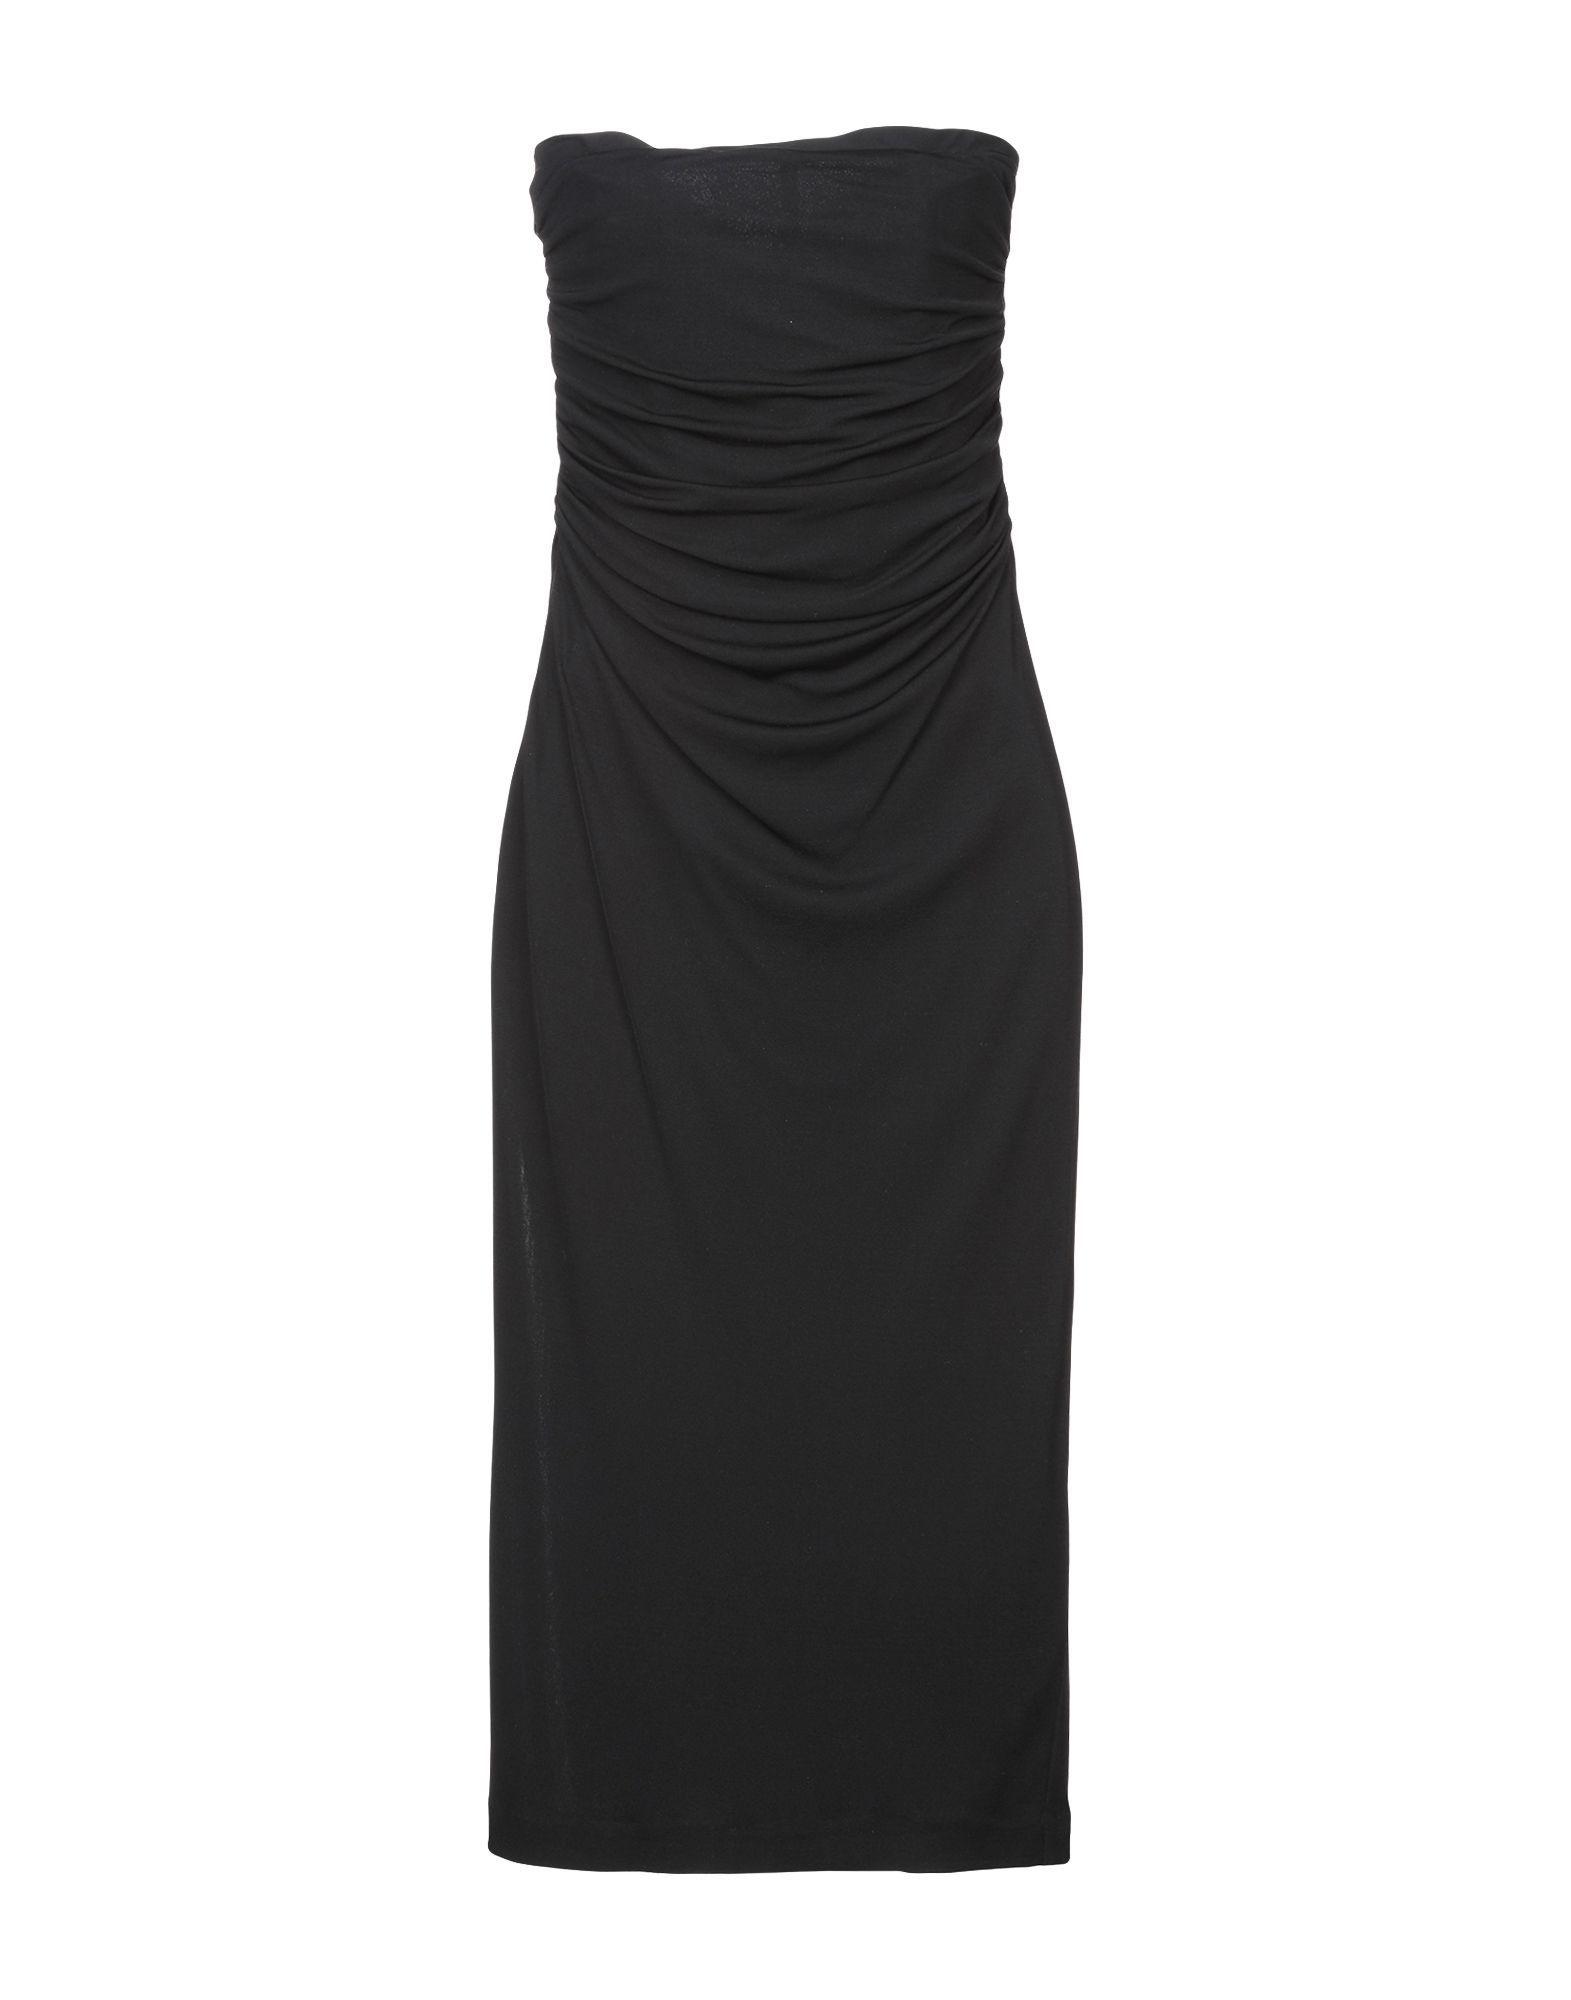 DRESSES Woman Giambattista Valli Black Silk